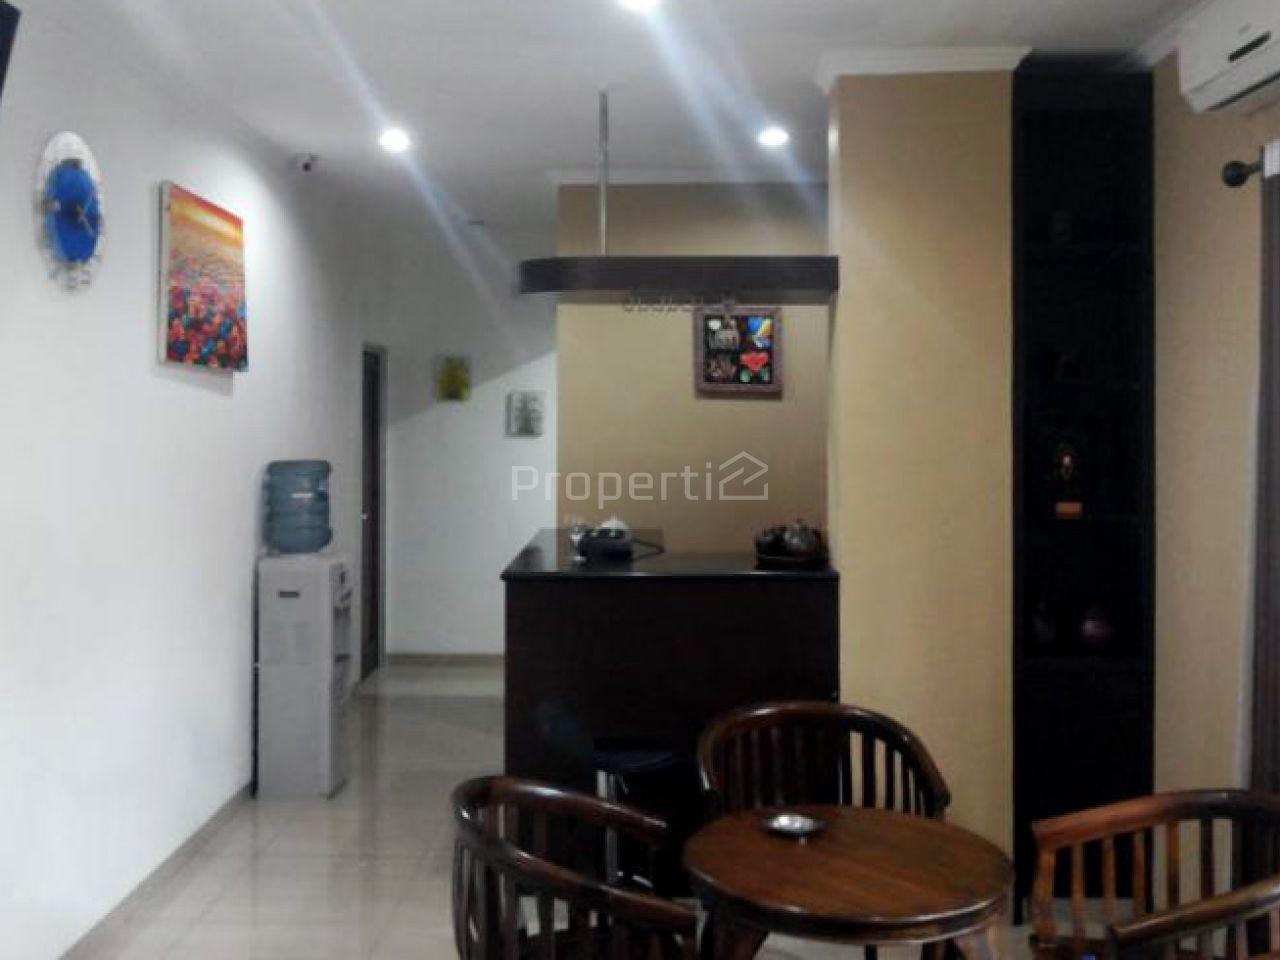 Rumah Kost 4 Lantai Strategis di Fatmawati, Jakarta Selatan